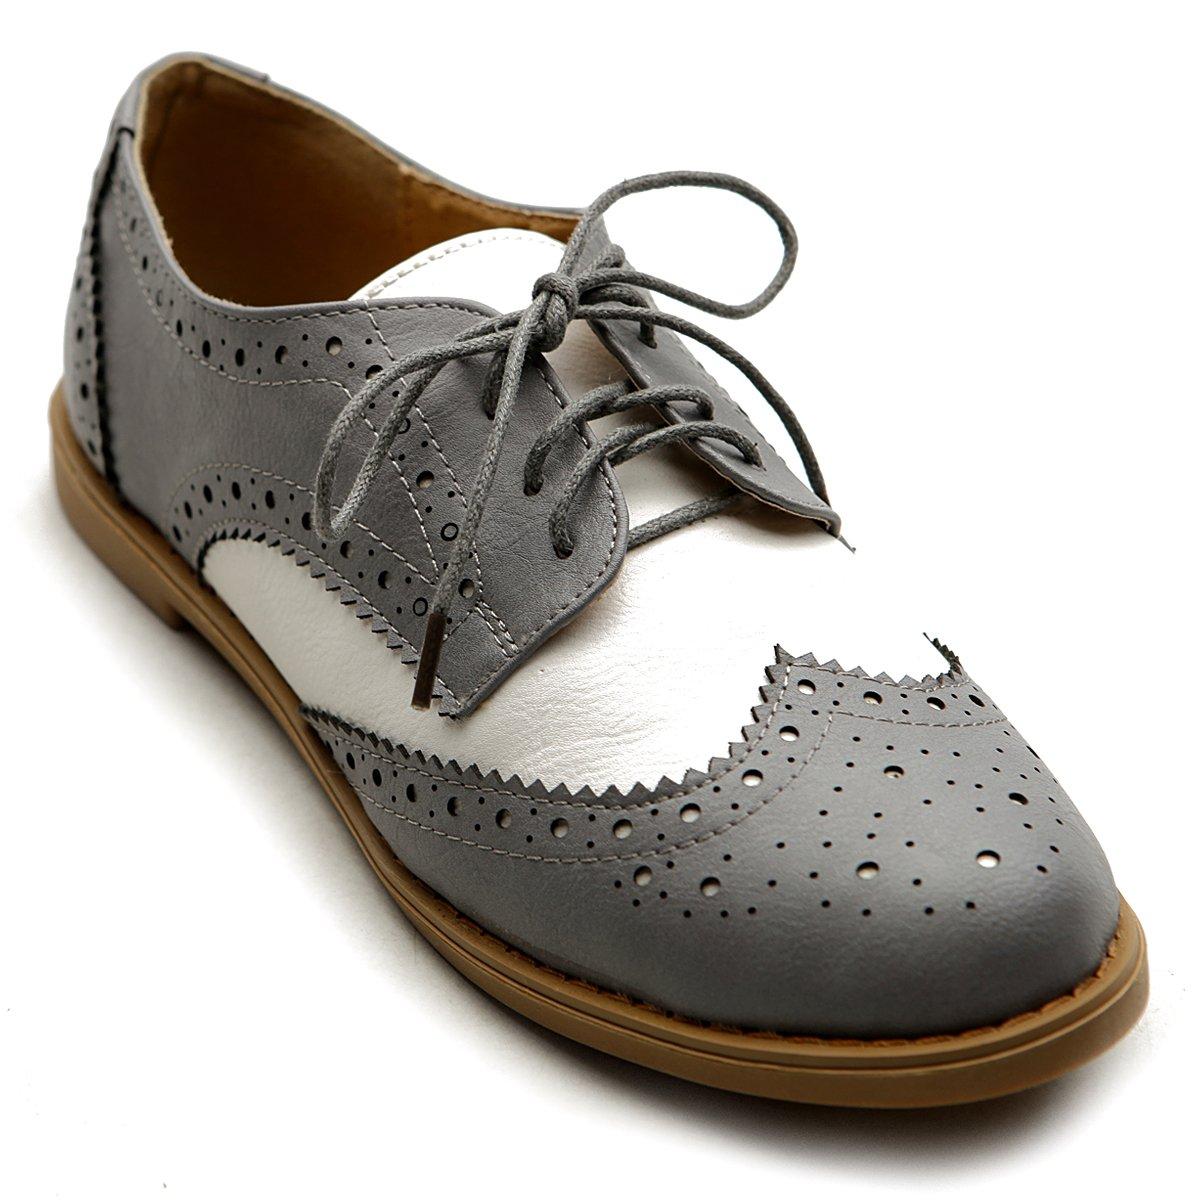 Ollio Women's Flat Shoe Wingtip Lace Up Two Tone Oxford M2913(8.5 B(M) US, Grey)